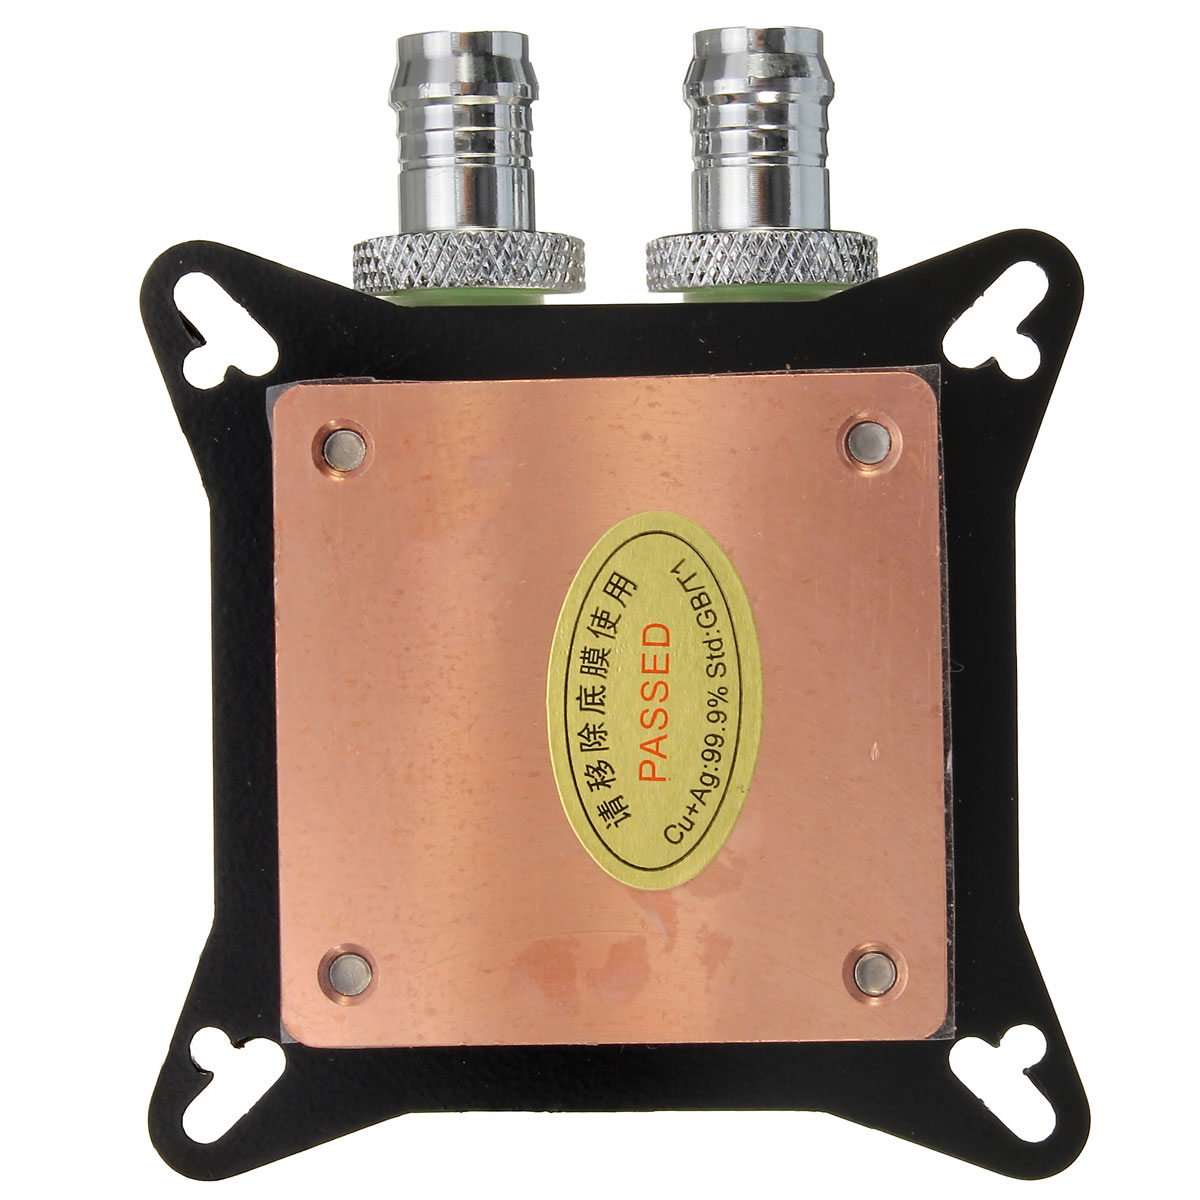 Gpu Water Cooling Block Pc Copper High Performance Liquid